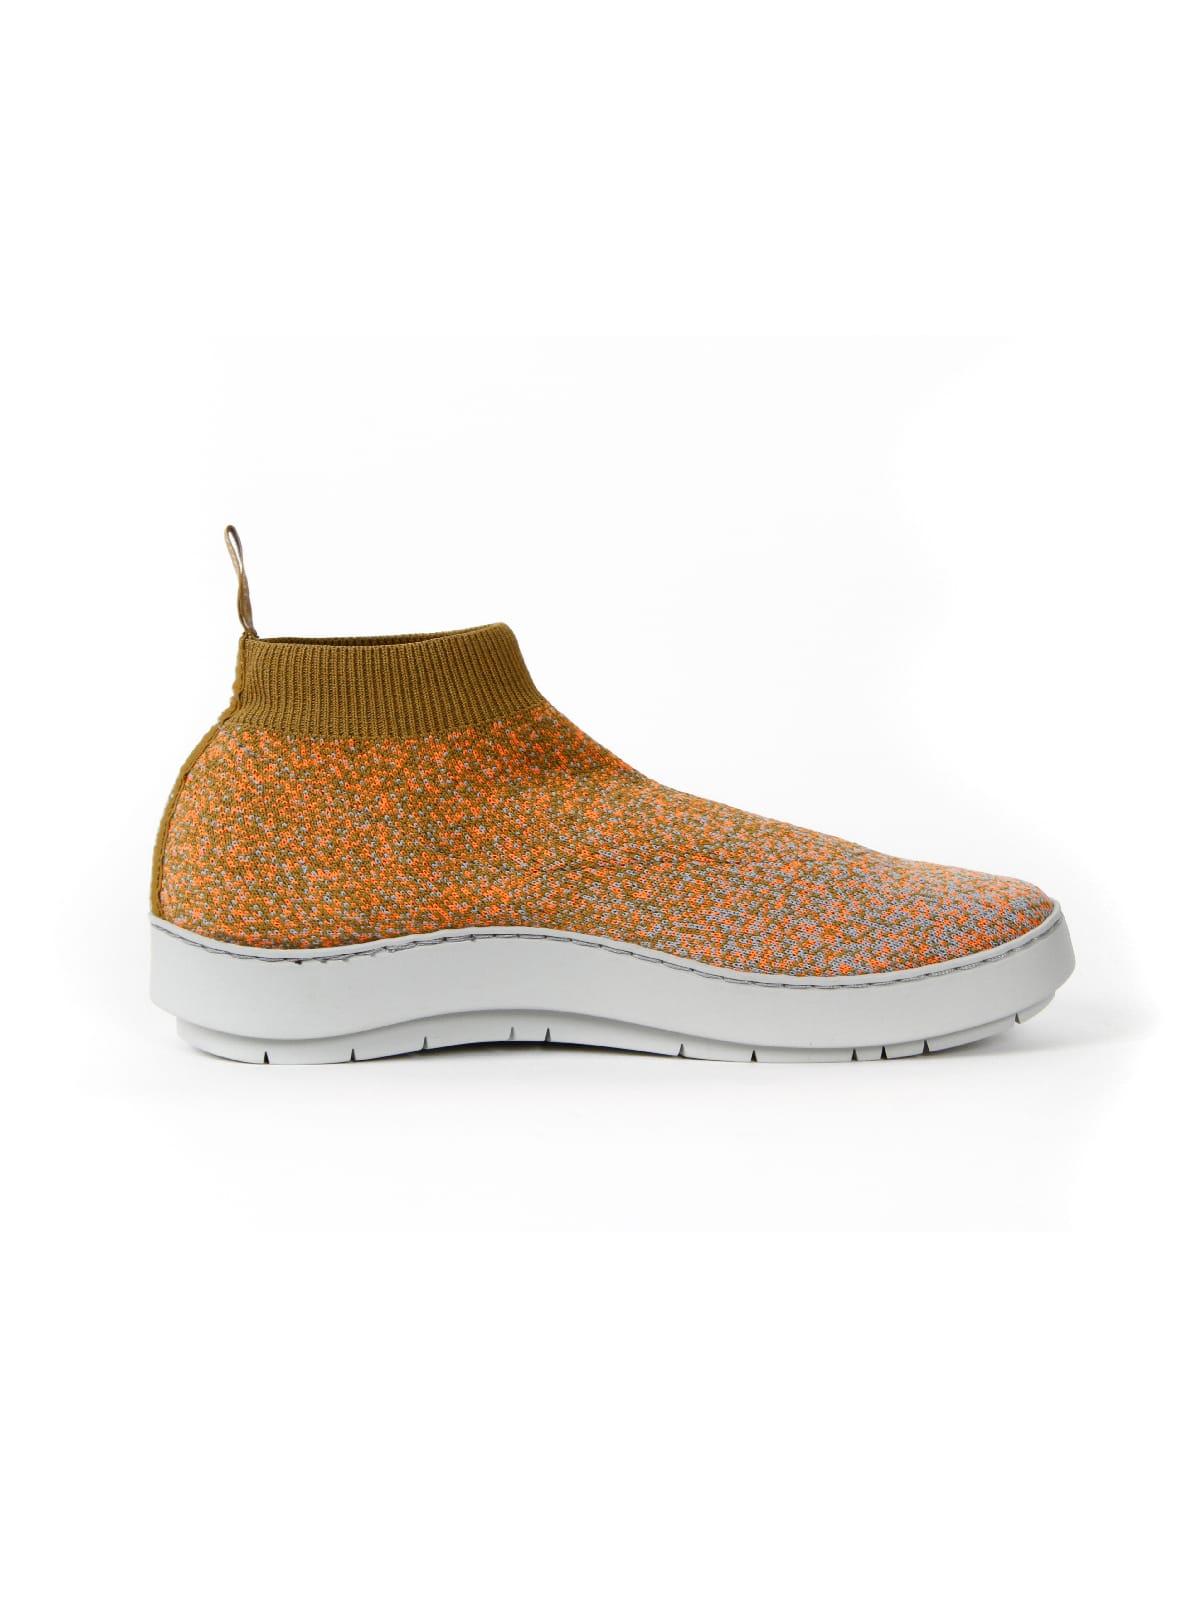 3D knitted sockboot Spexx papaya rechts